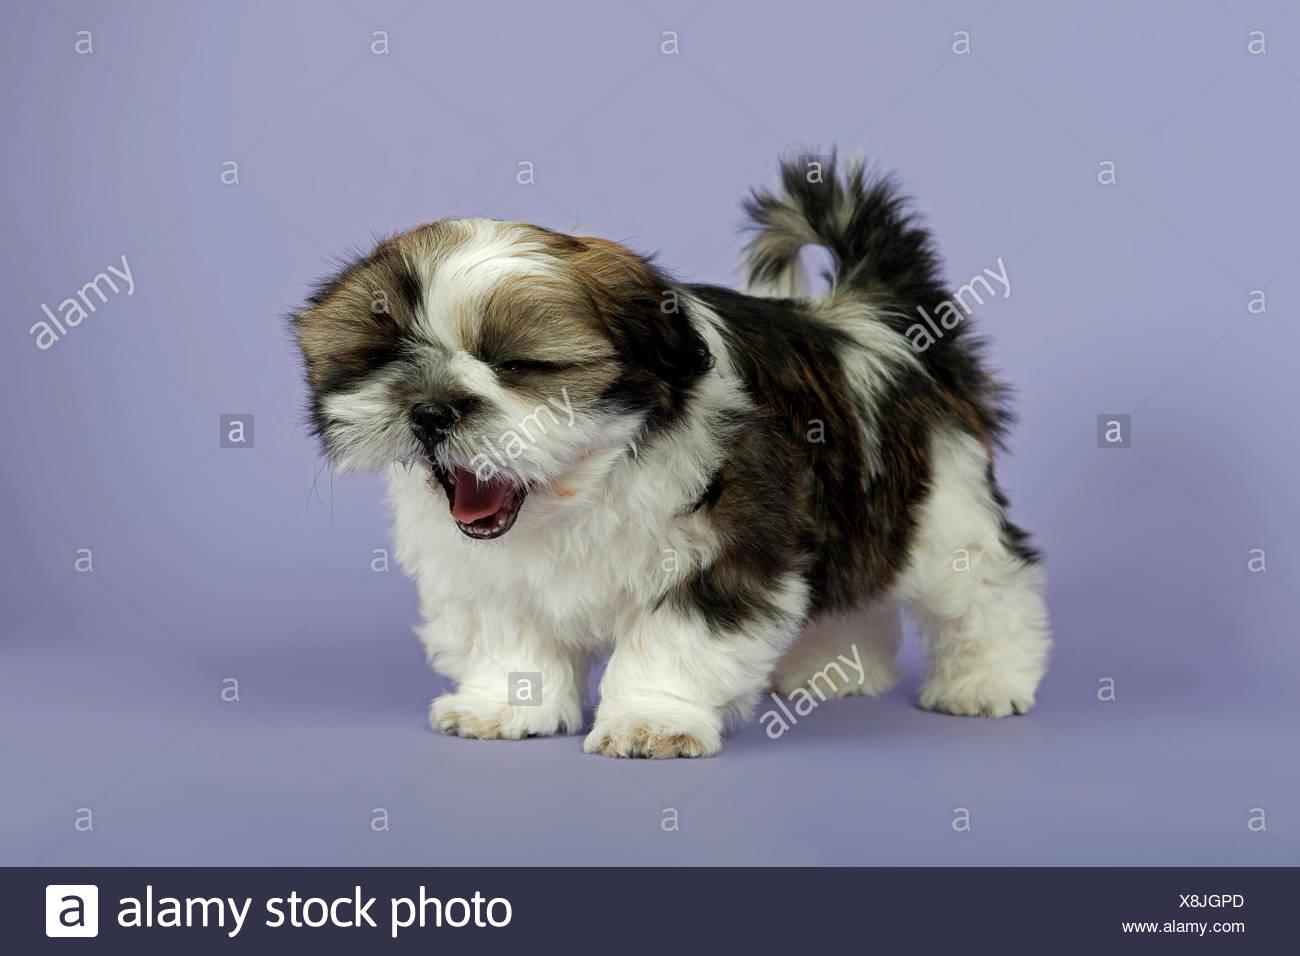 Shih Tzu Puppies 10 Weeks Gold White Stock Photo 280691445 Alamy